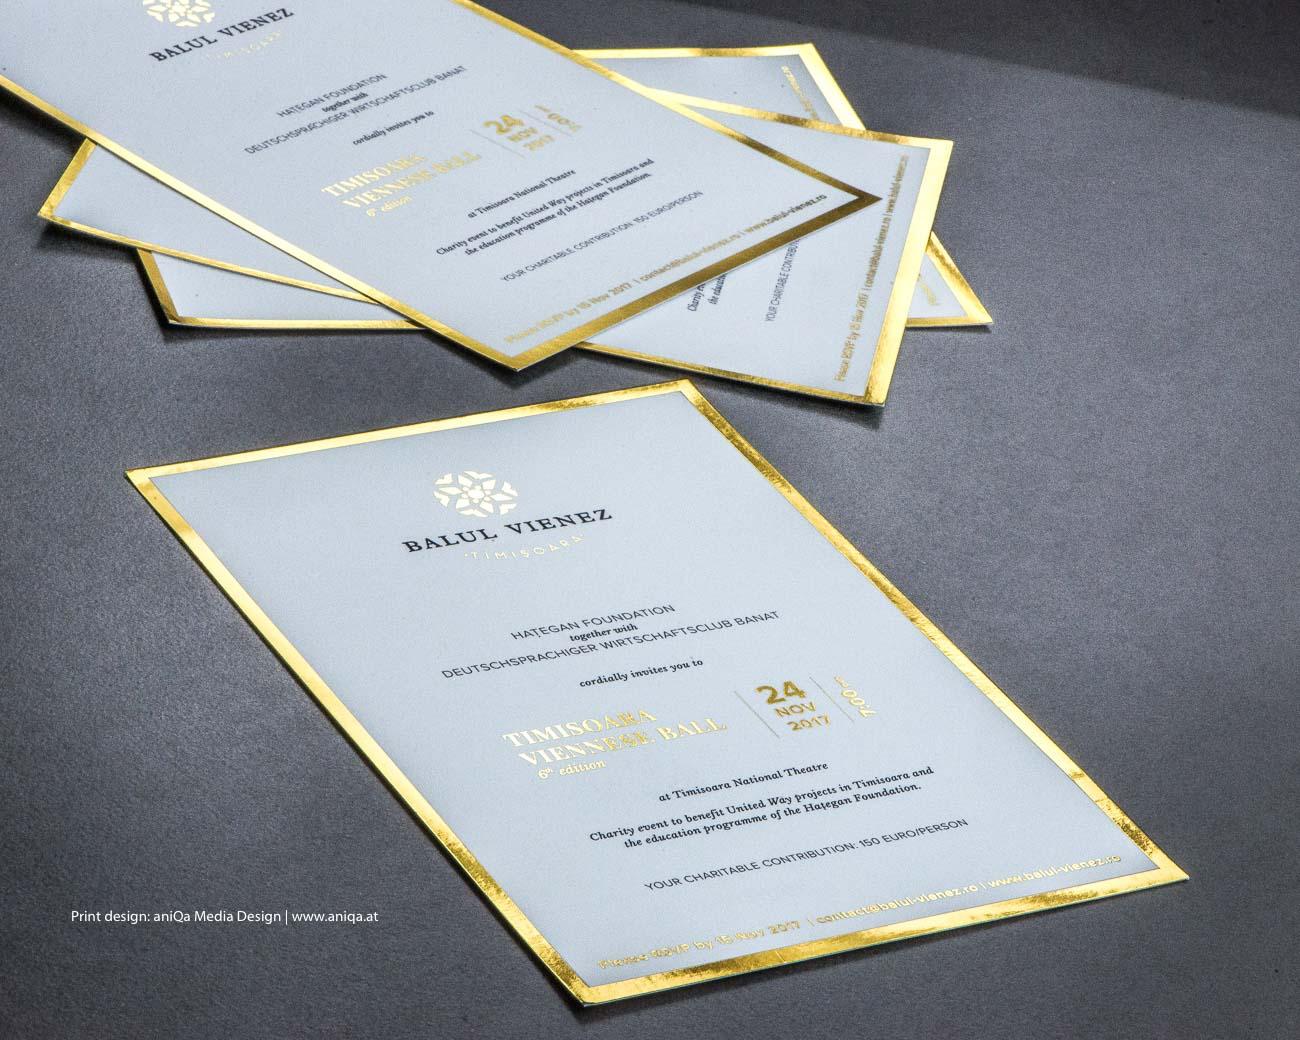 print-graphic-aniqa-media-design-003